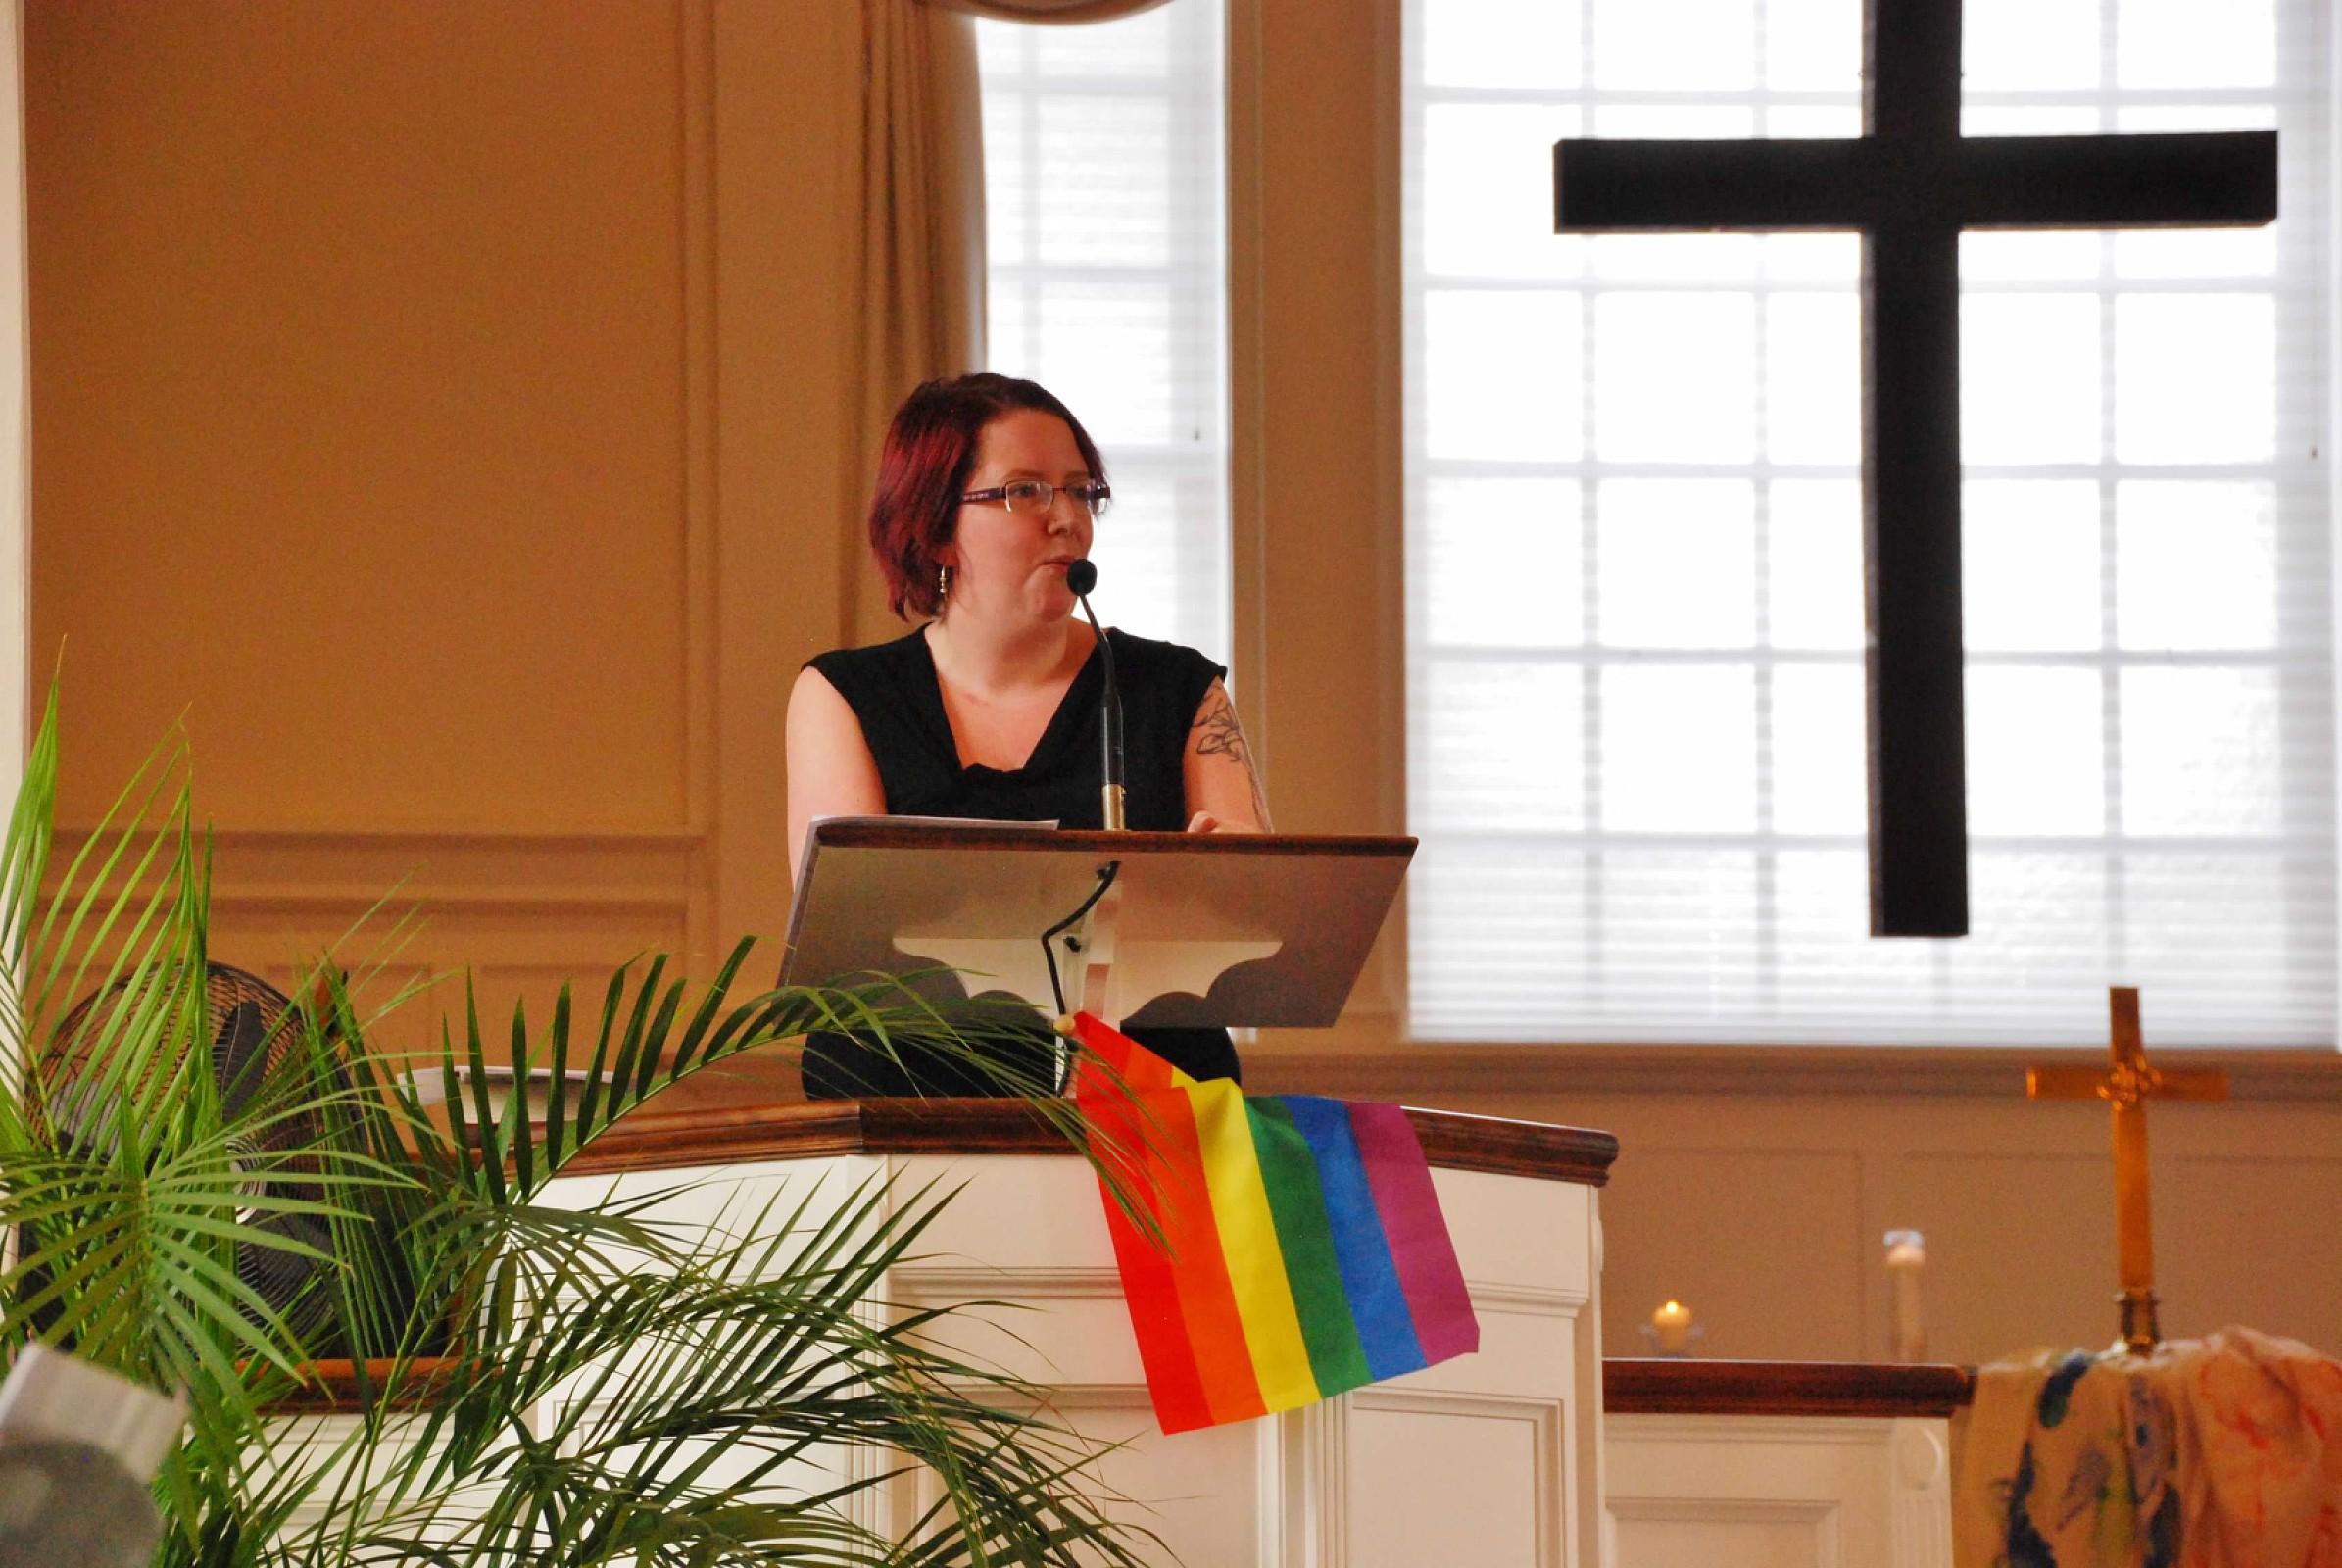 LGBTQ affirming diverse congregation